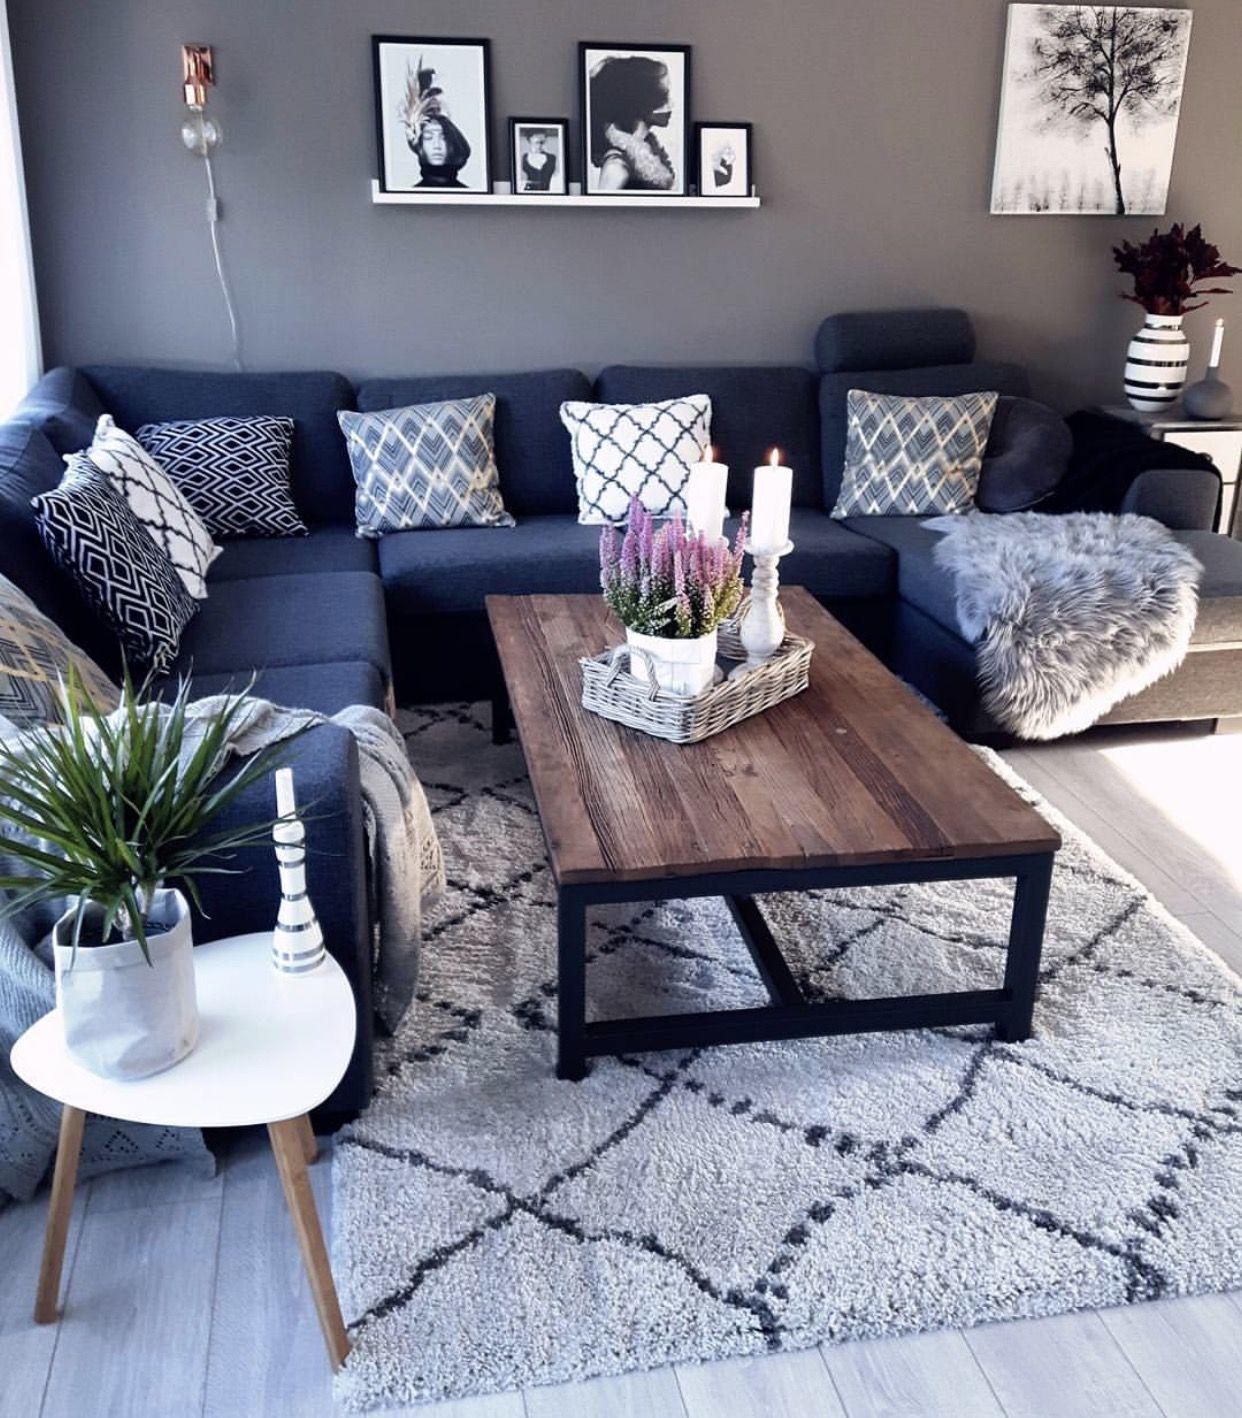 Moderne Wohnzimmer Einrichtung Dream Home Eclectic Living Room